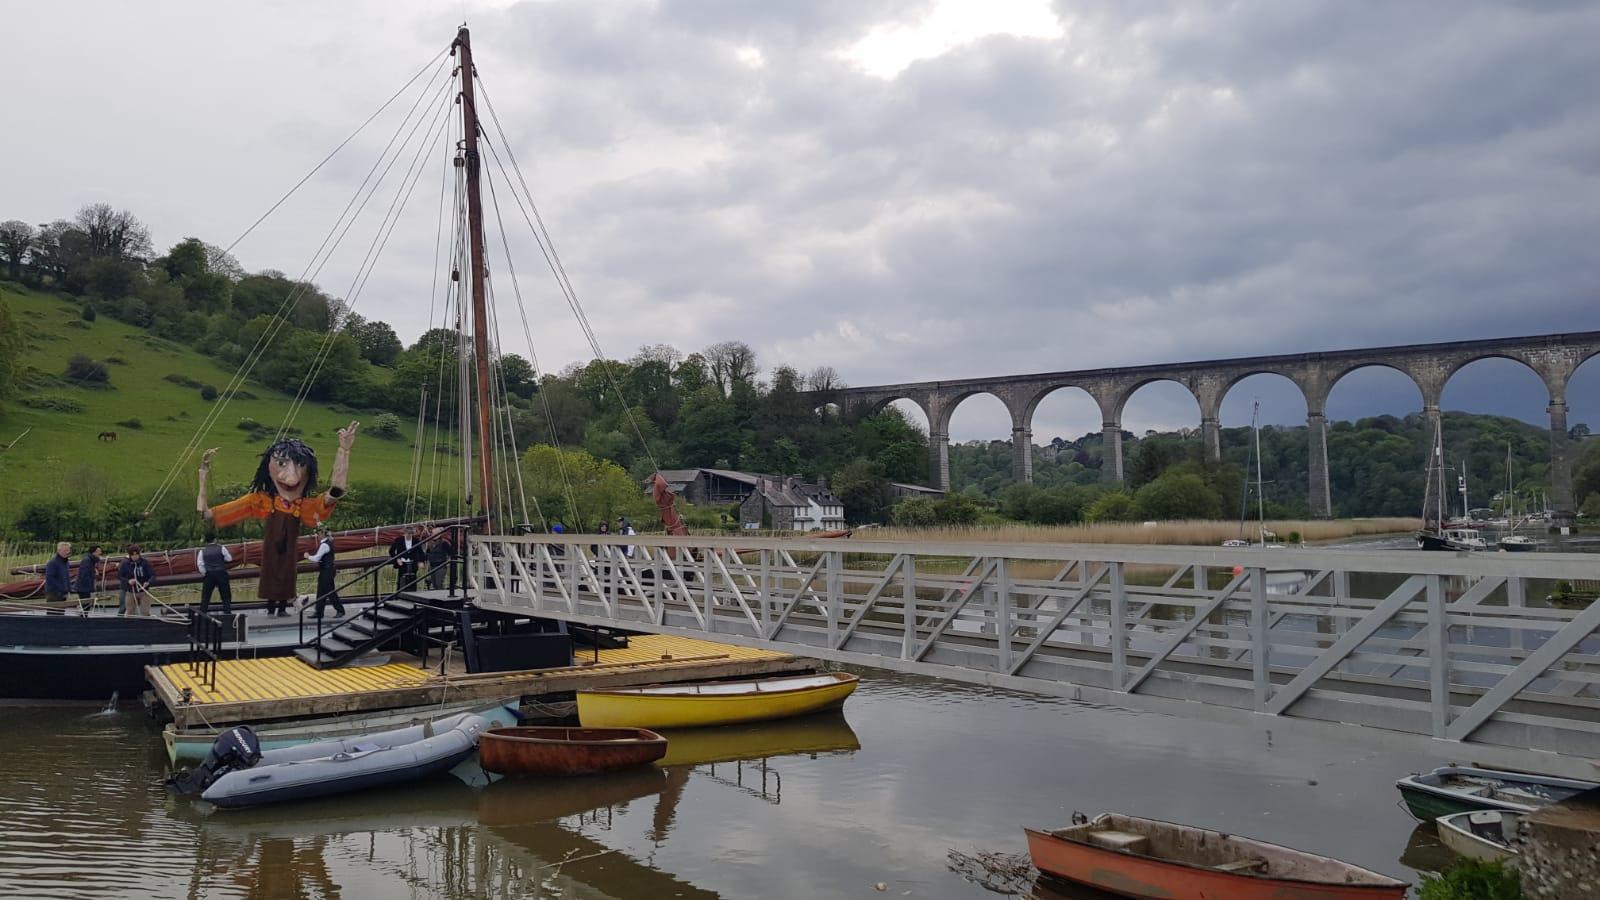 Calstock Giant Boat